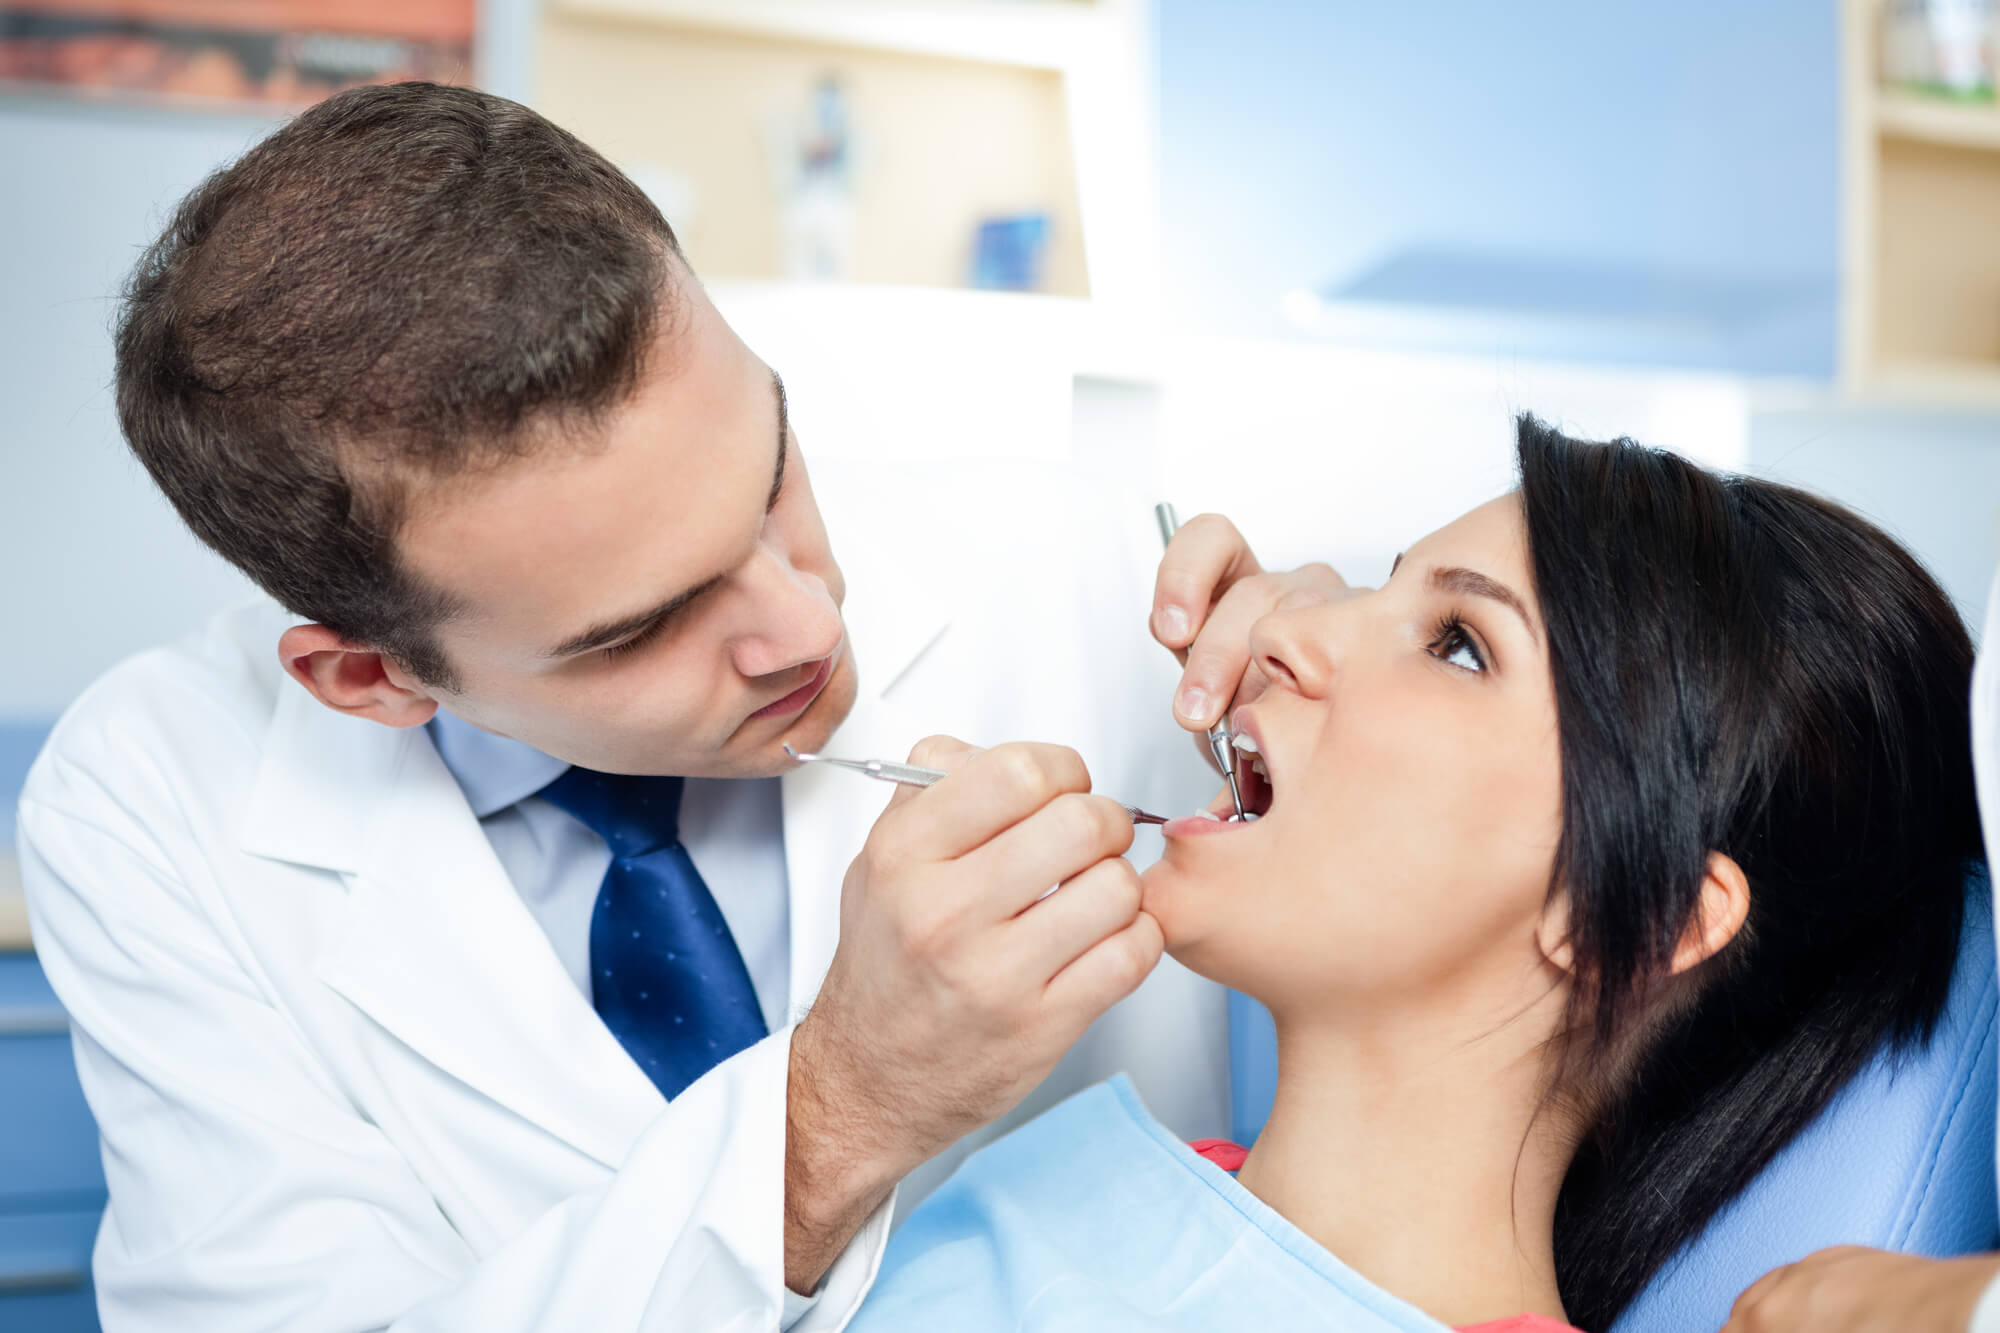 Where has the best Restorative Dentistry Charleston SC?